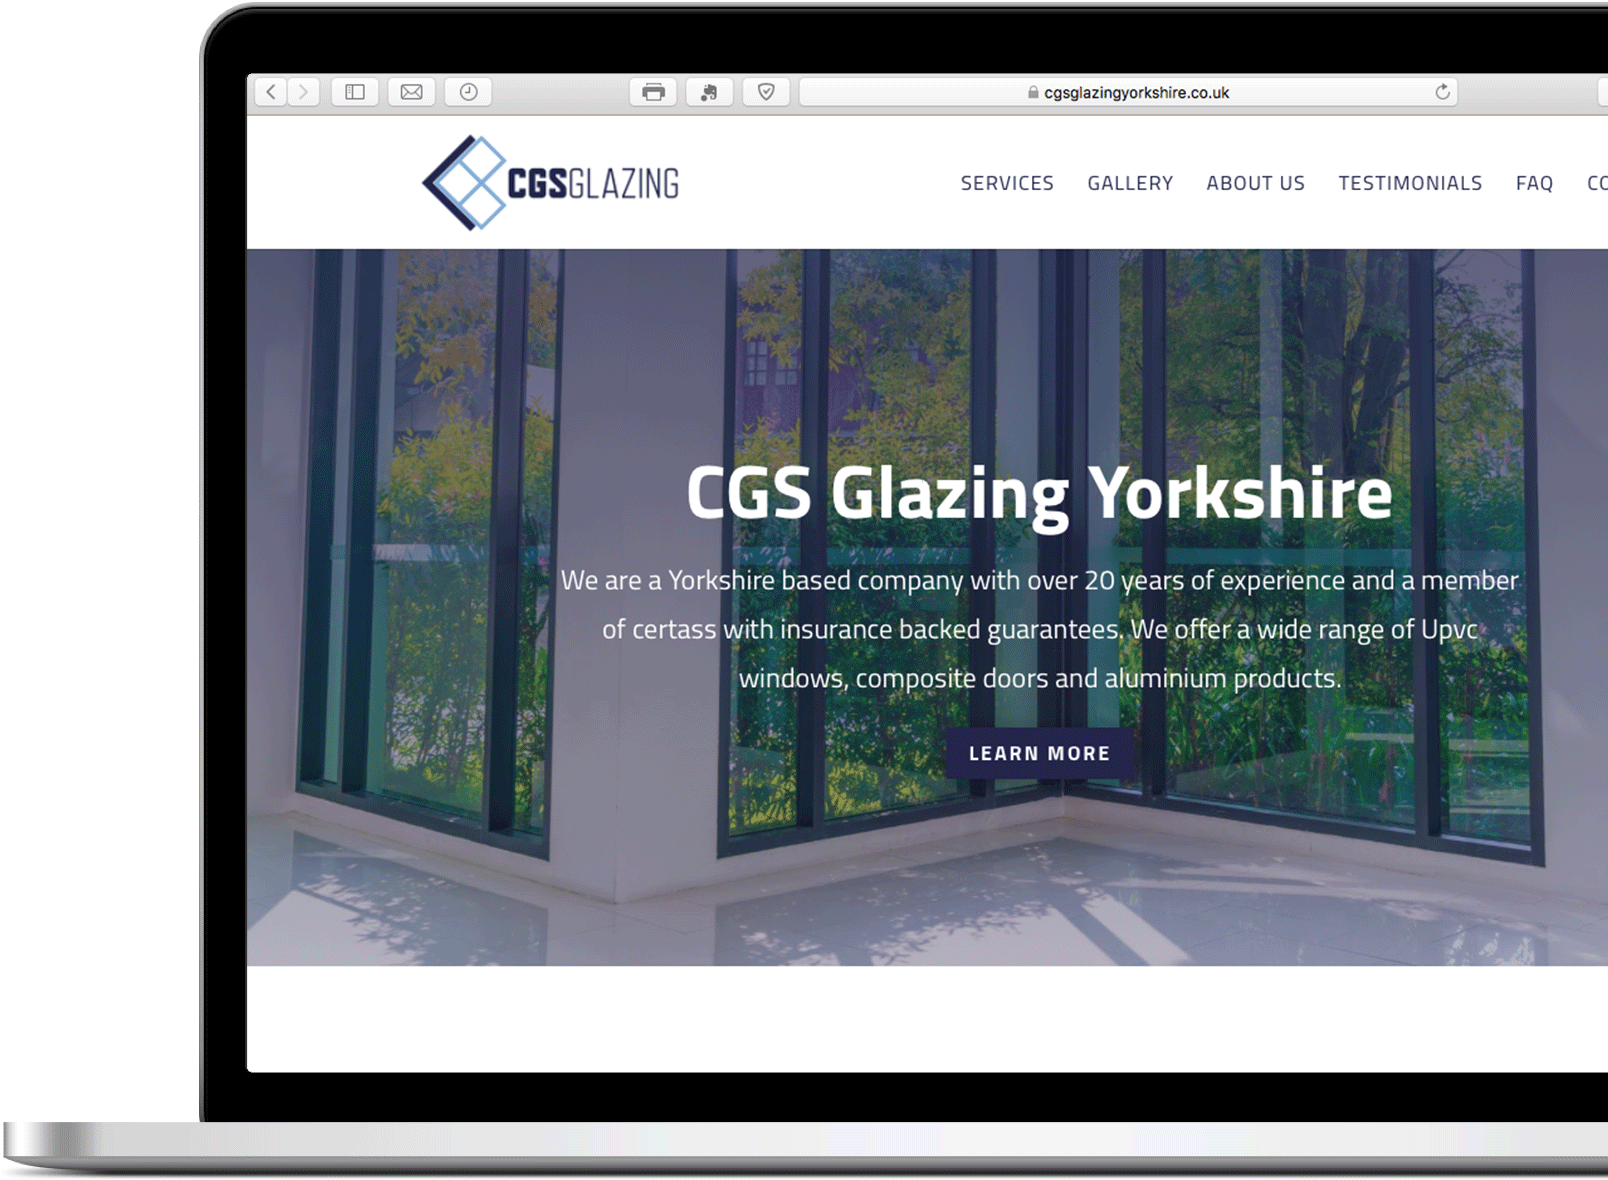 web design cgs glazing yorkshire